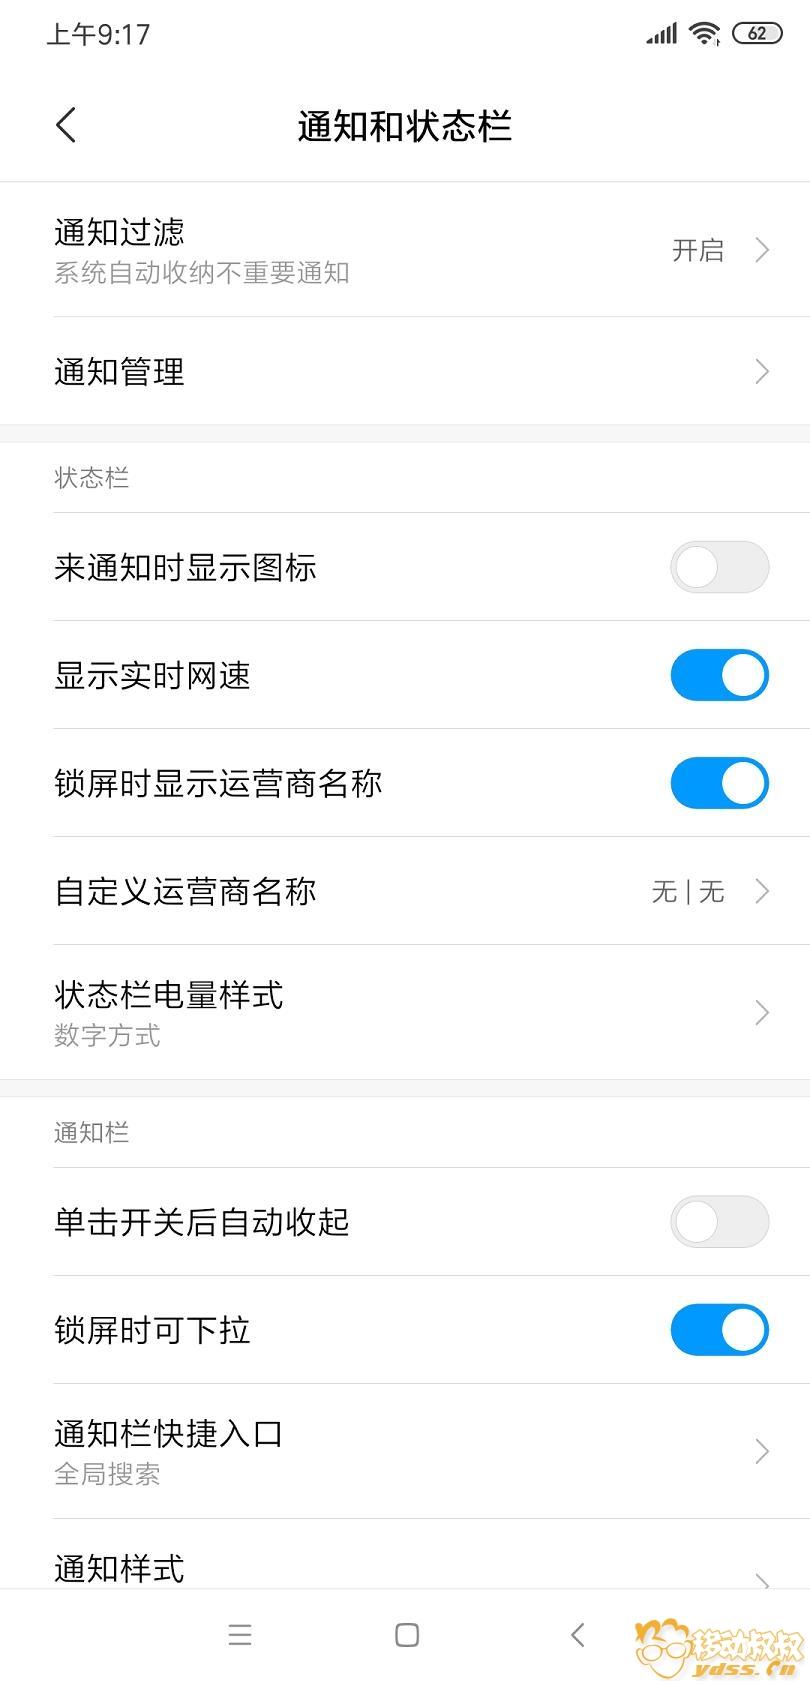 Screenshot_2019-05-12-09-17-42-207_com.android.settings.png